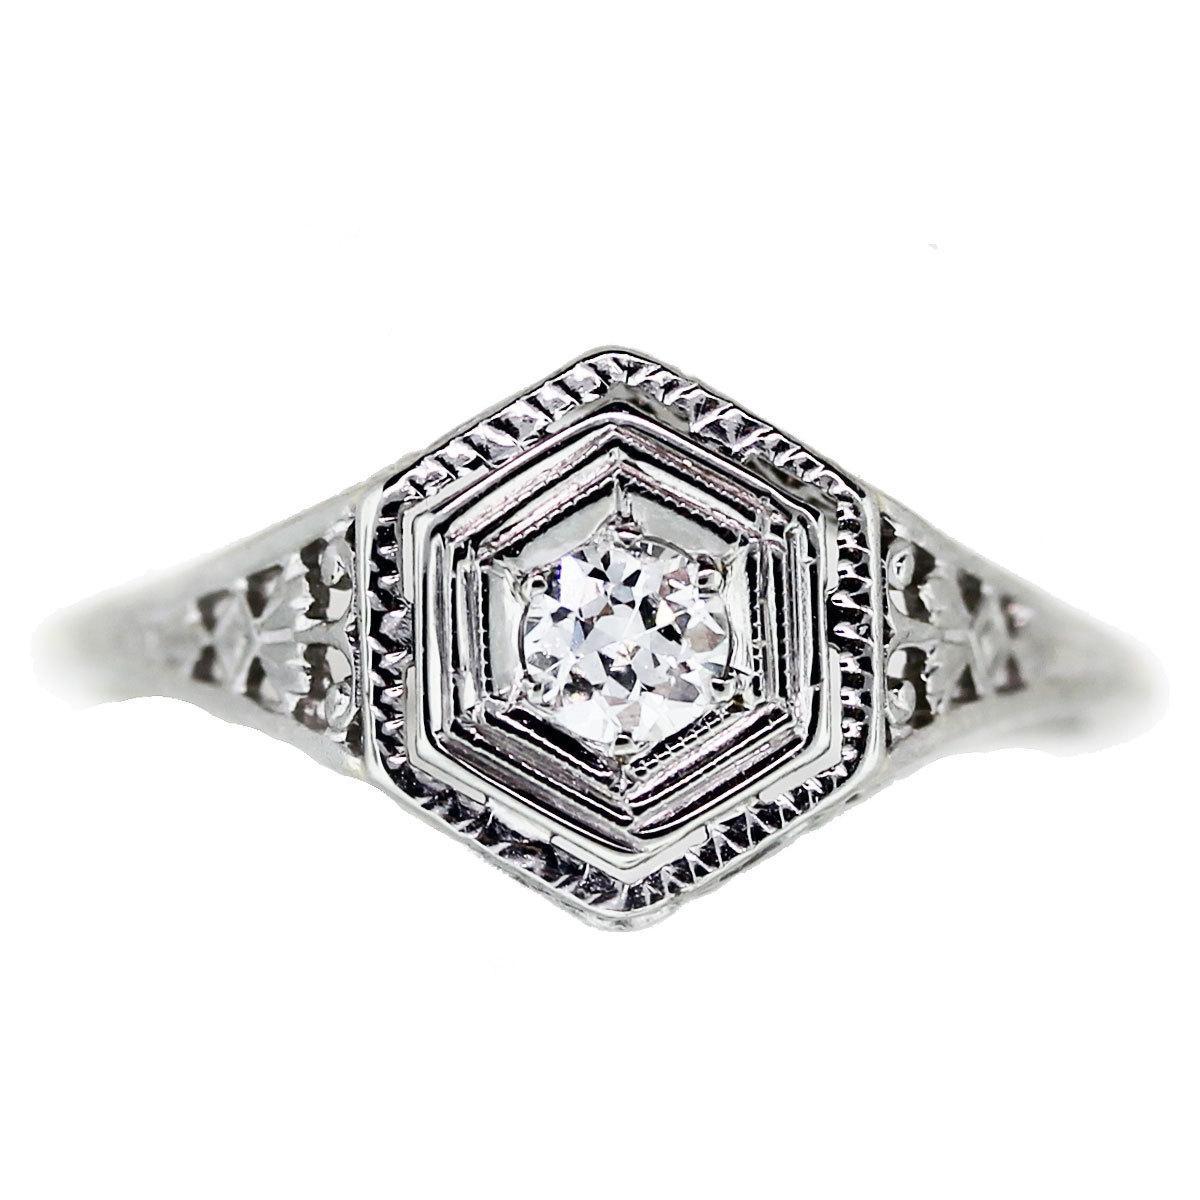 engagement ring eye candy engagement rings under dollars wedding rings under vintage engagment ring under vintage engagement ring south florida